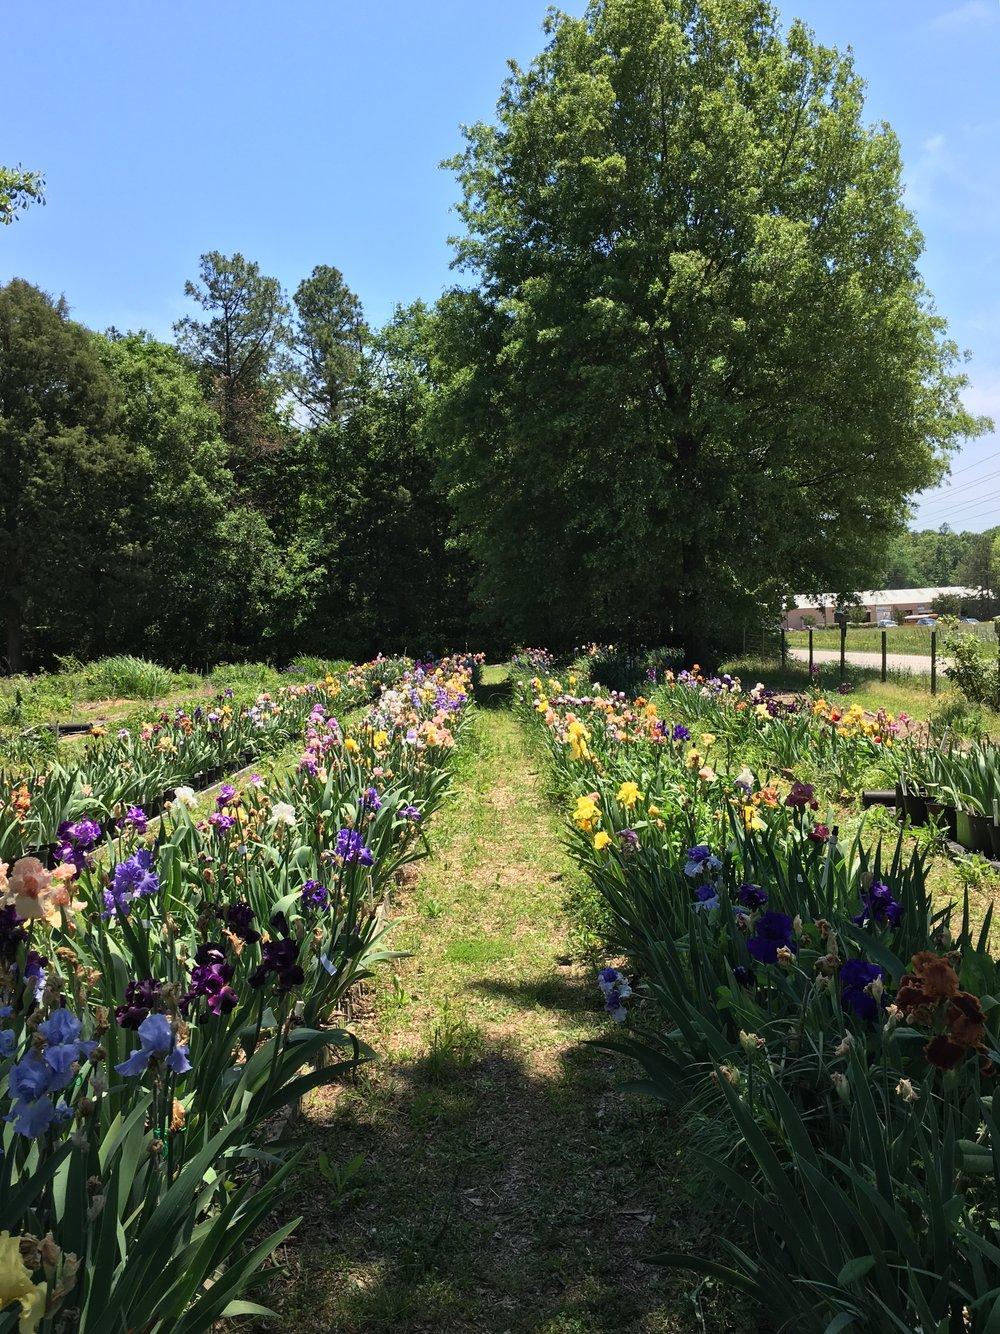 Annual Flower Fields at Heritage Fields Farm, South Carolina